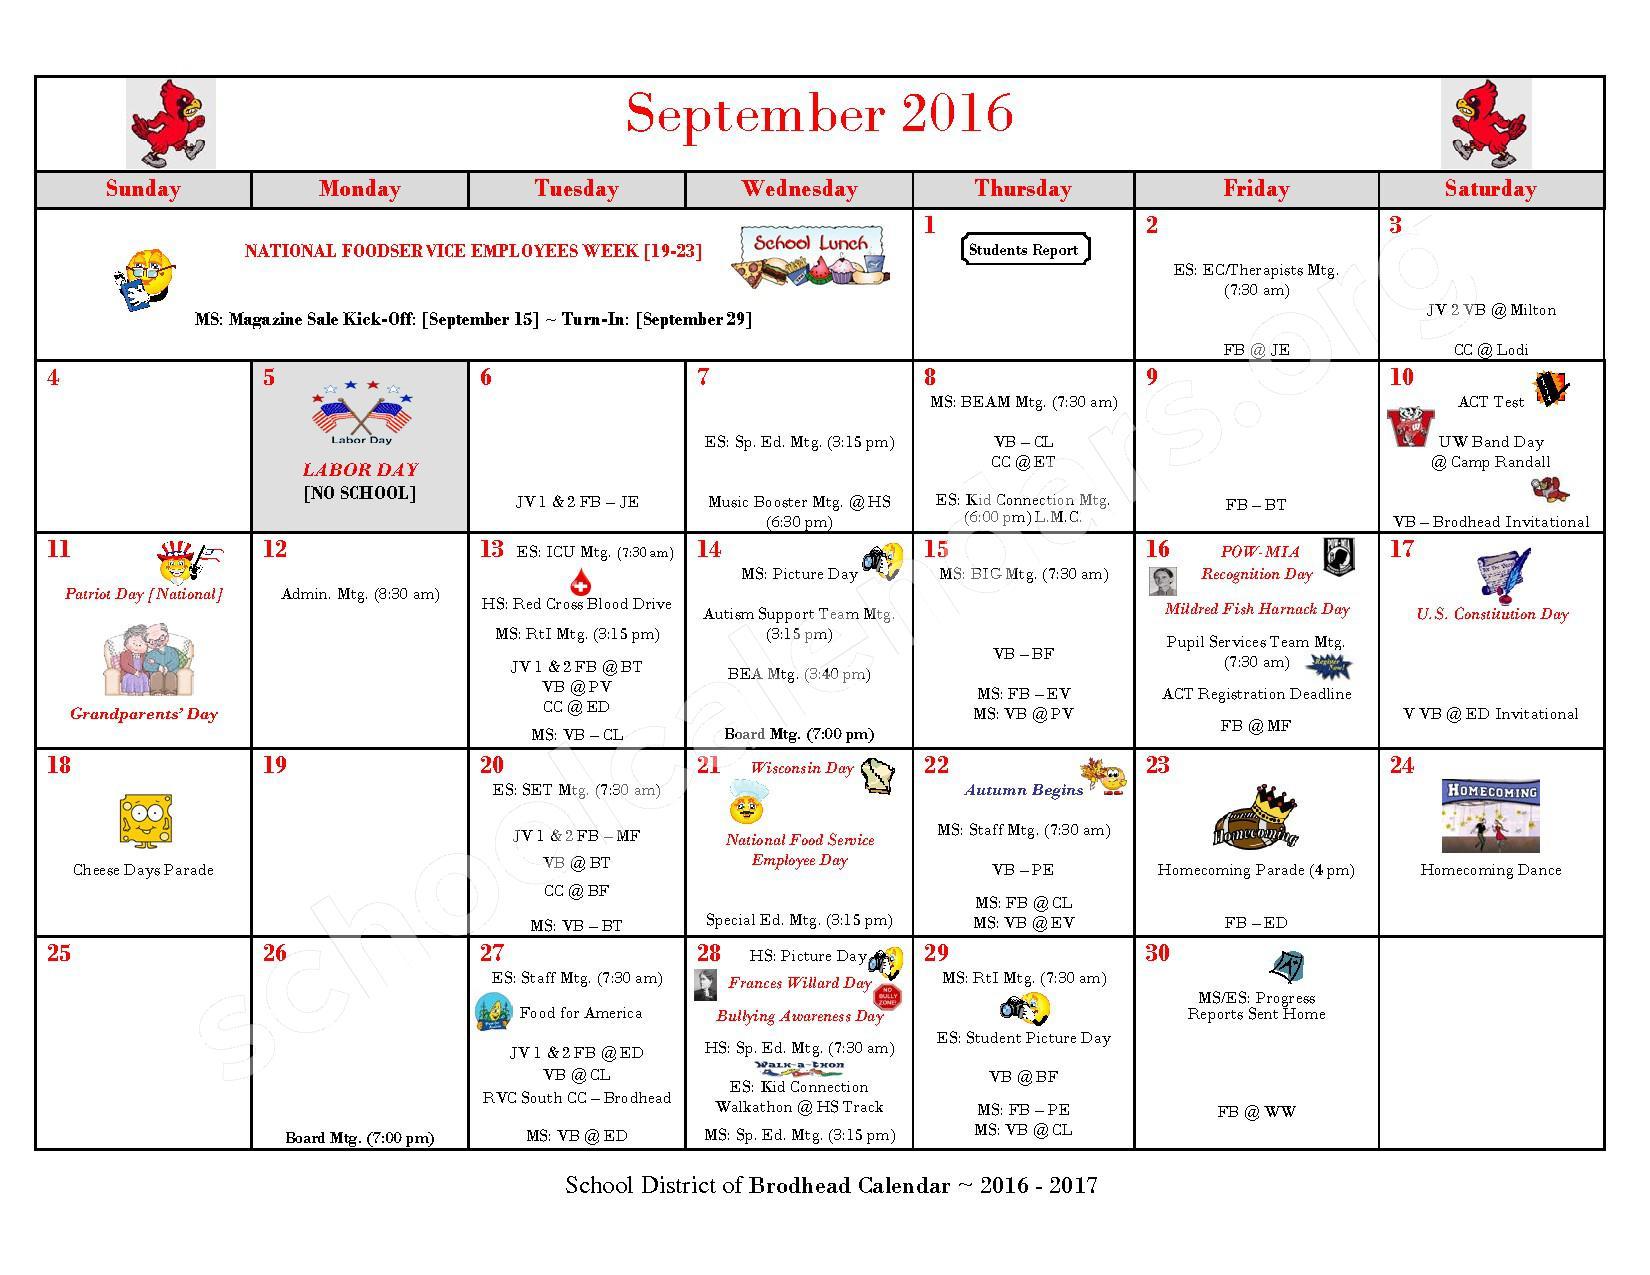 2016 - 2017 School Calendar – Brodhead School District – page 2